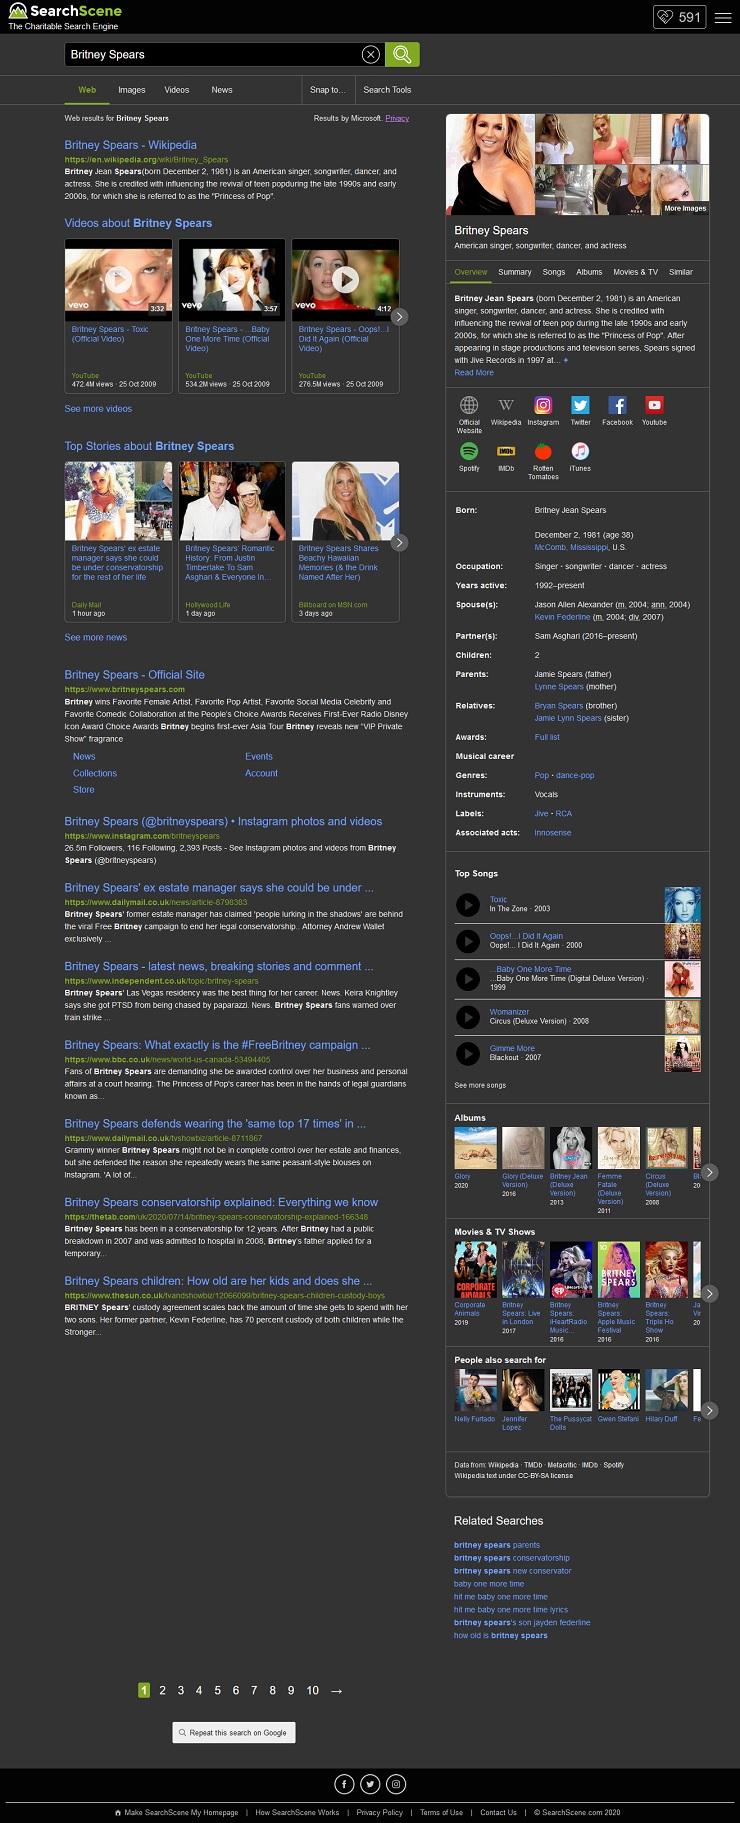 SearchScene's search results on dark mode.